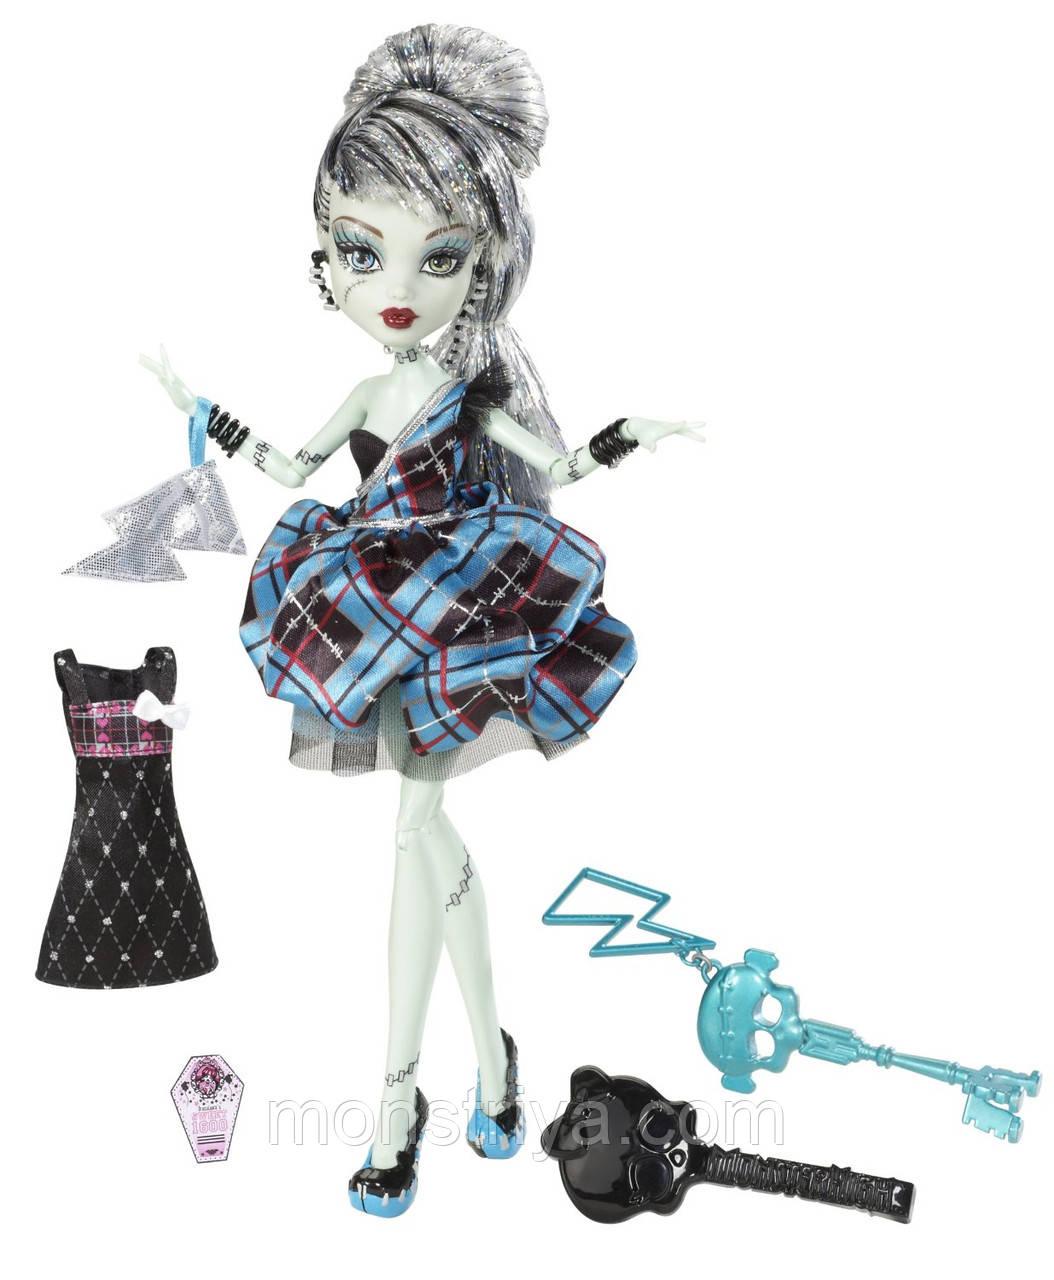 "Кукла Frankie Stein Sweet 1600 Фрэнки Штейн из серии ""День Рождения"""